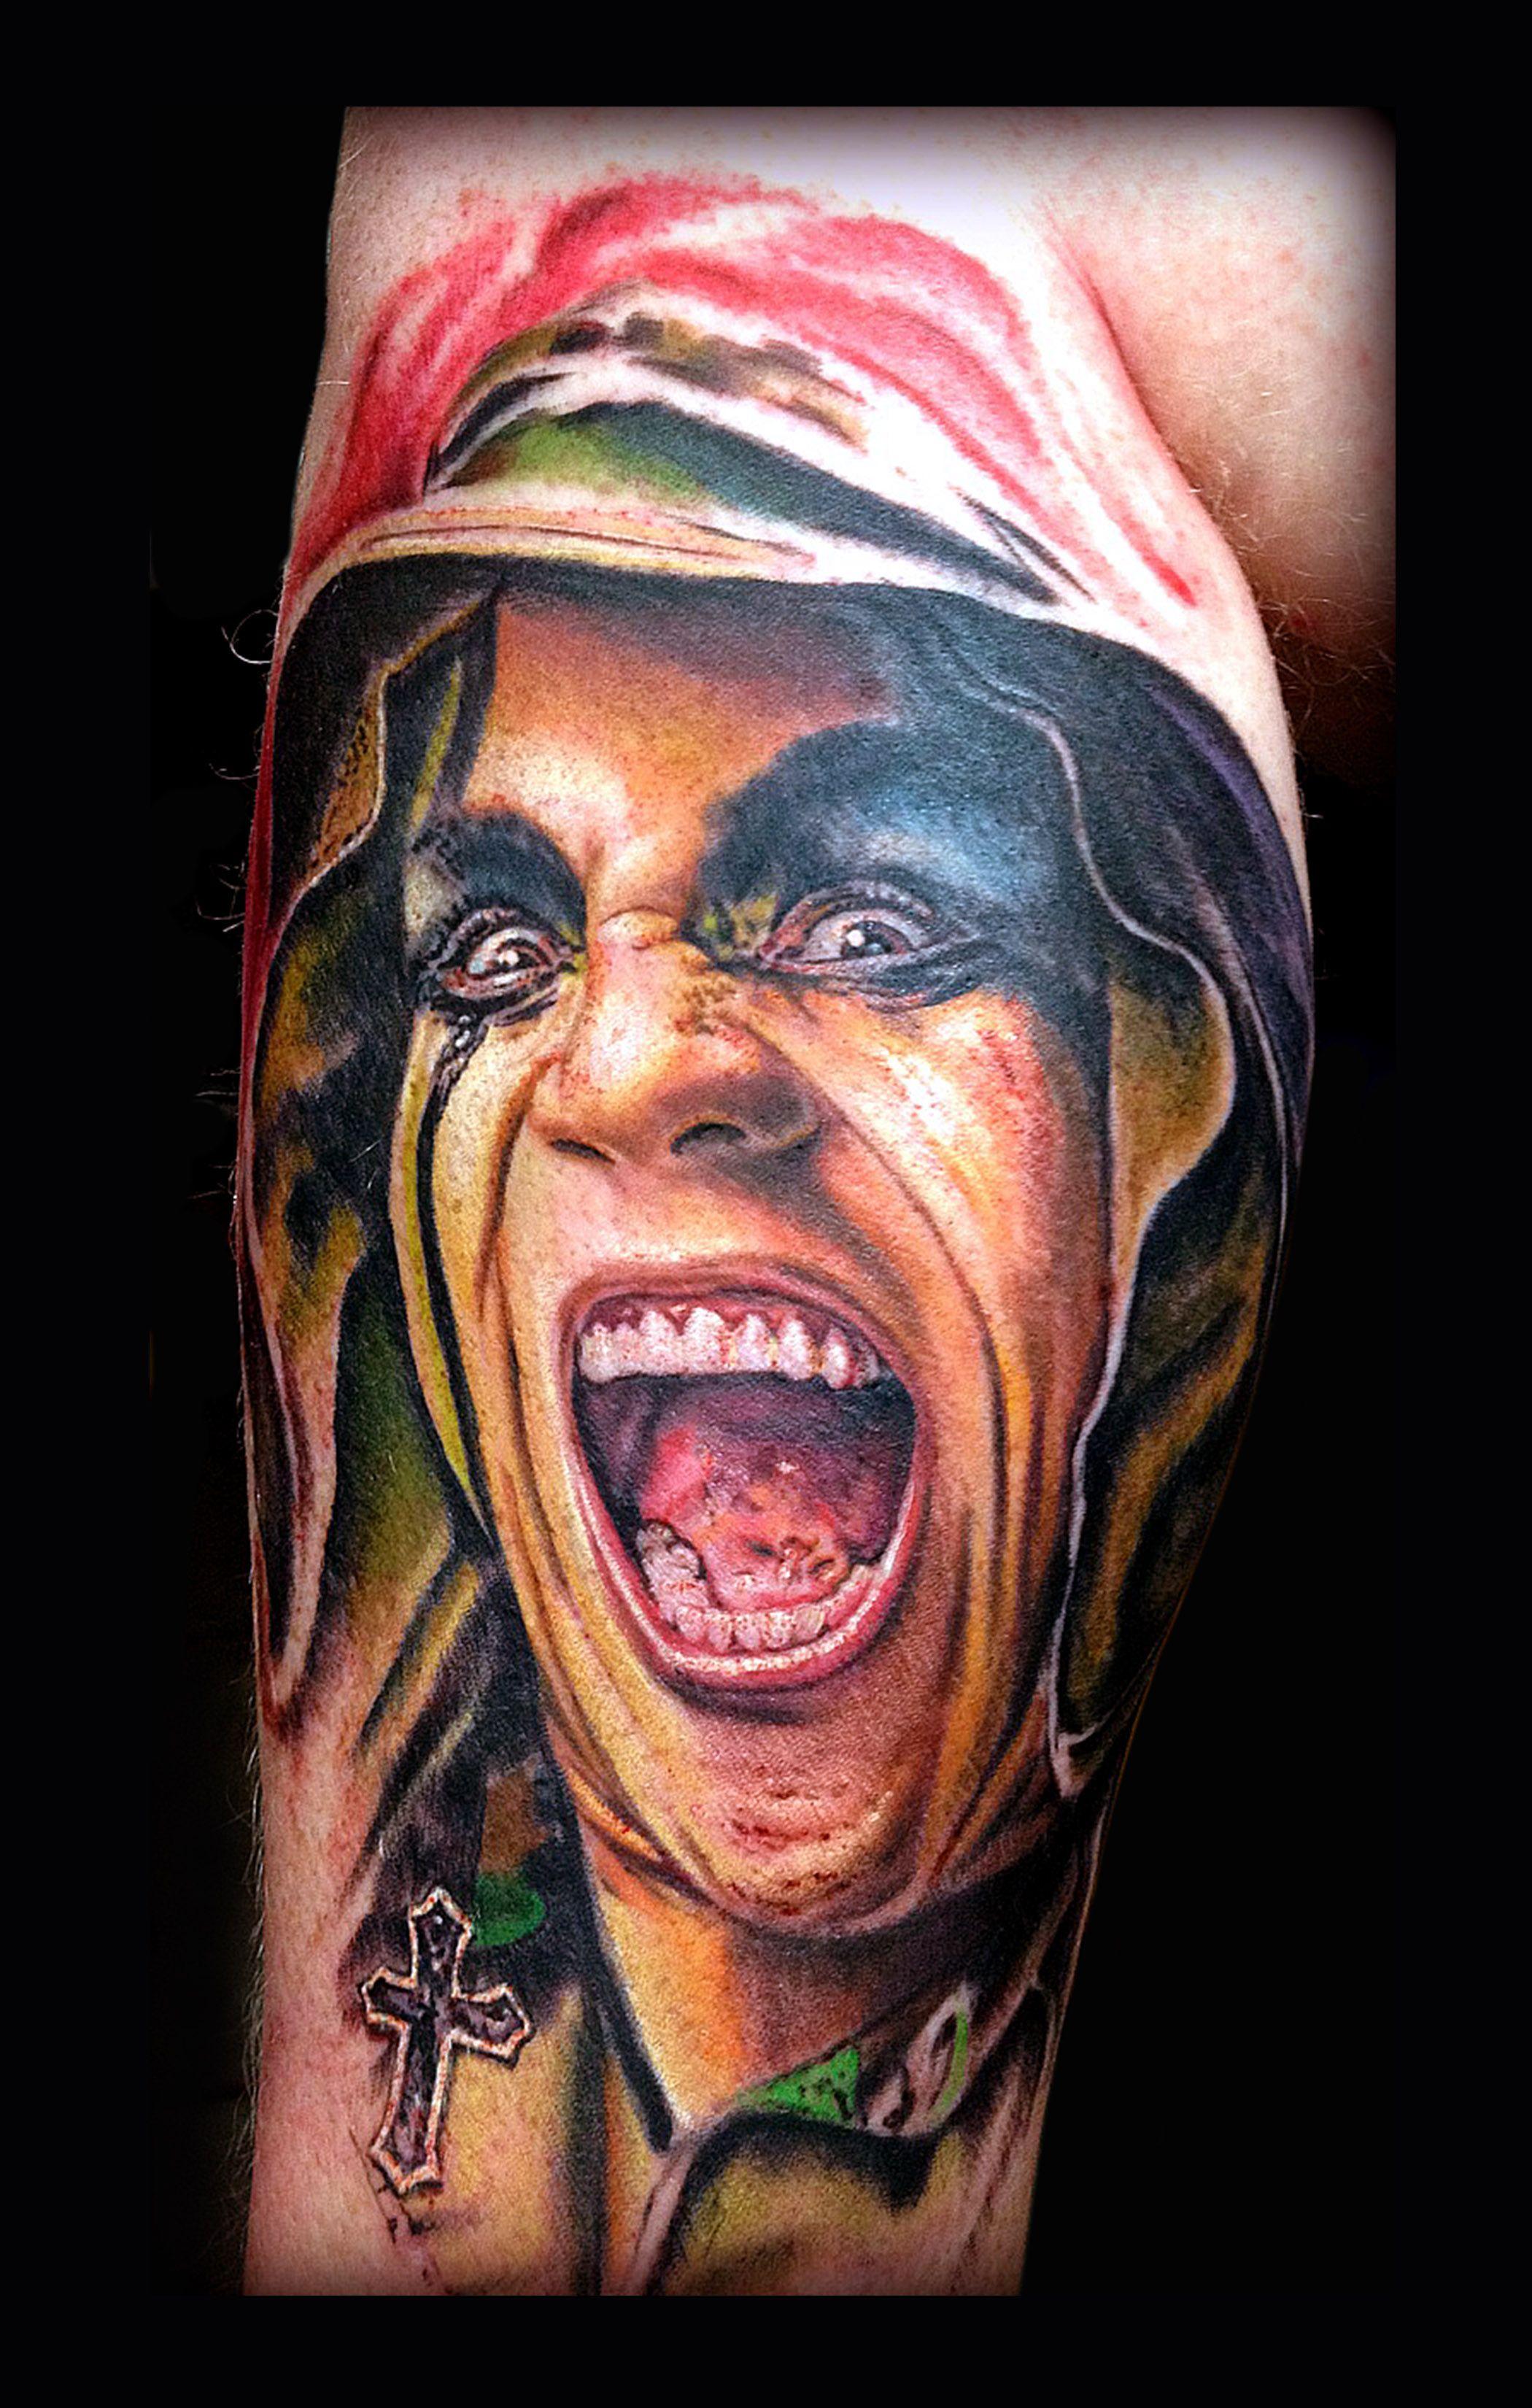 Watercolor tattoo artists in houston texas - Tattoo By Jp Roldan From Demon Ink Tattoo In Houston Texas